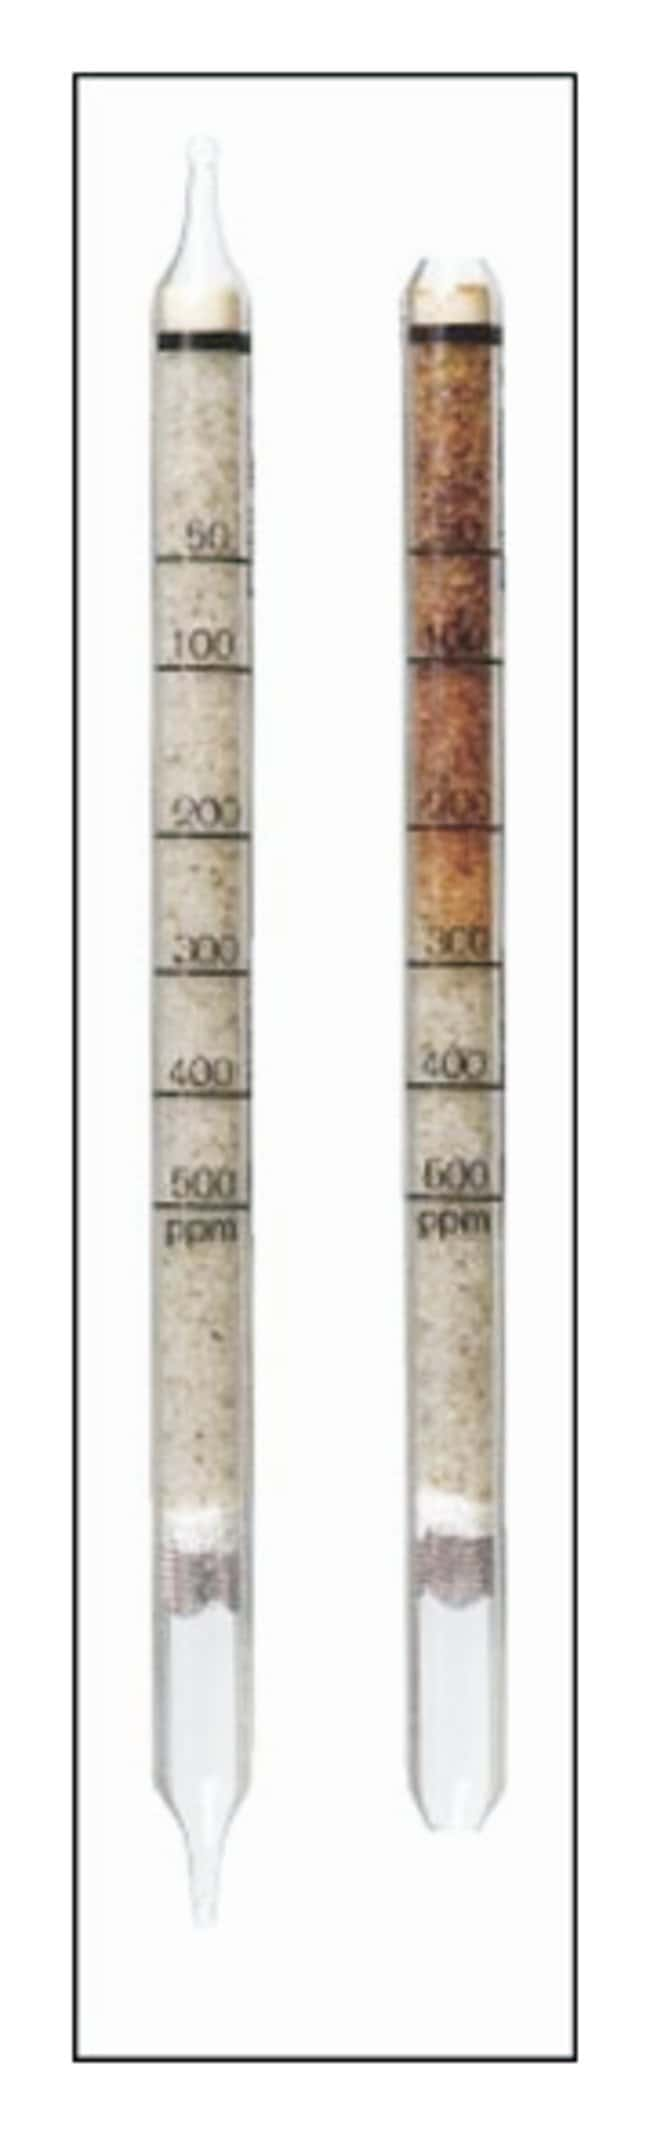 Dräger™Short-Term Detector Tubes: Chlorine